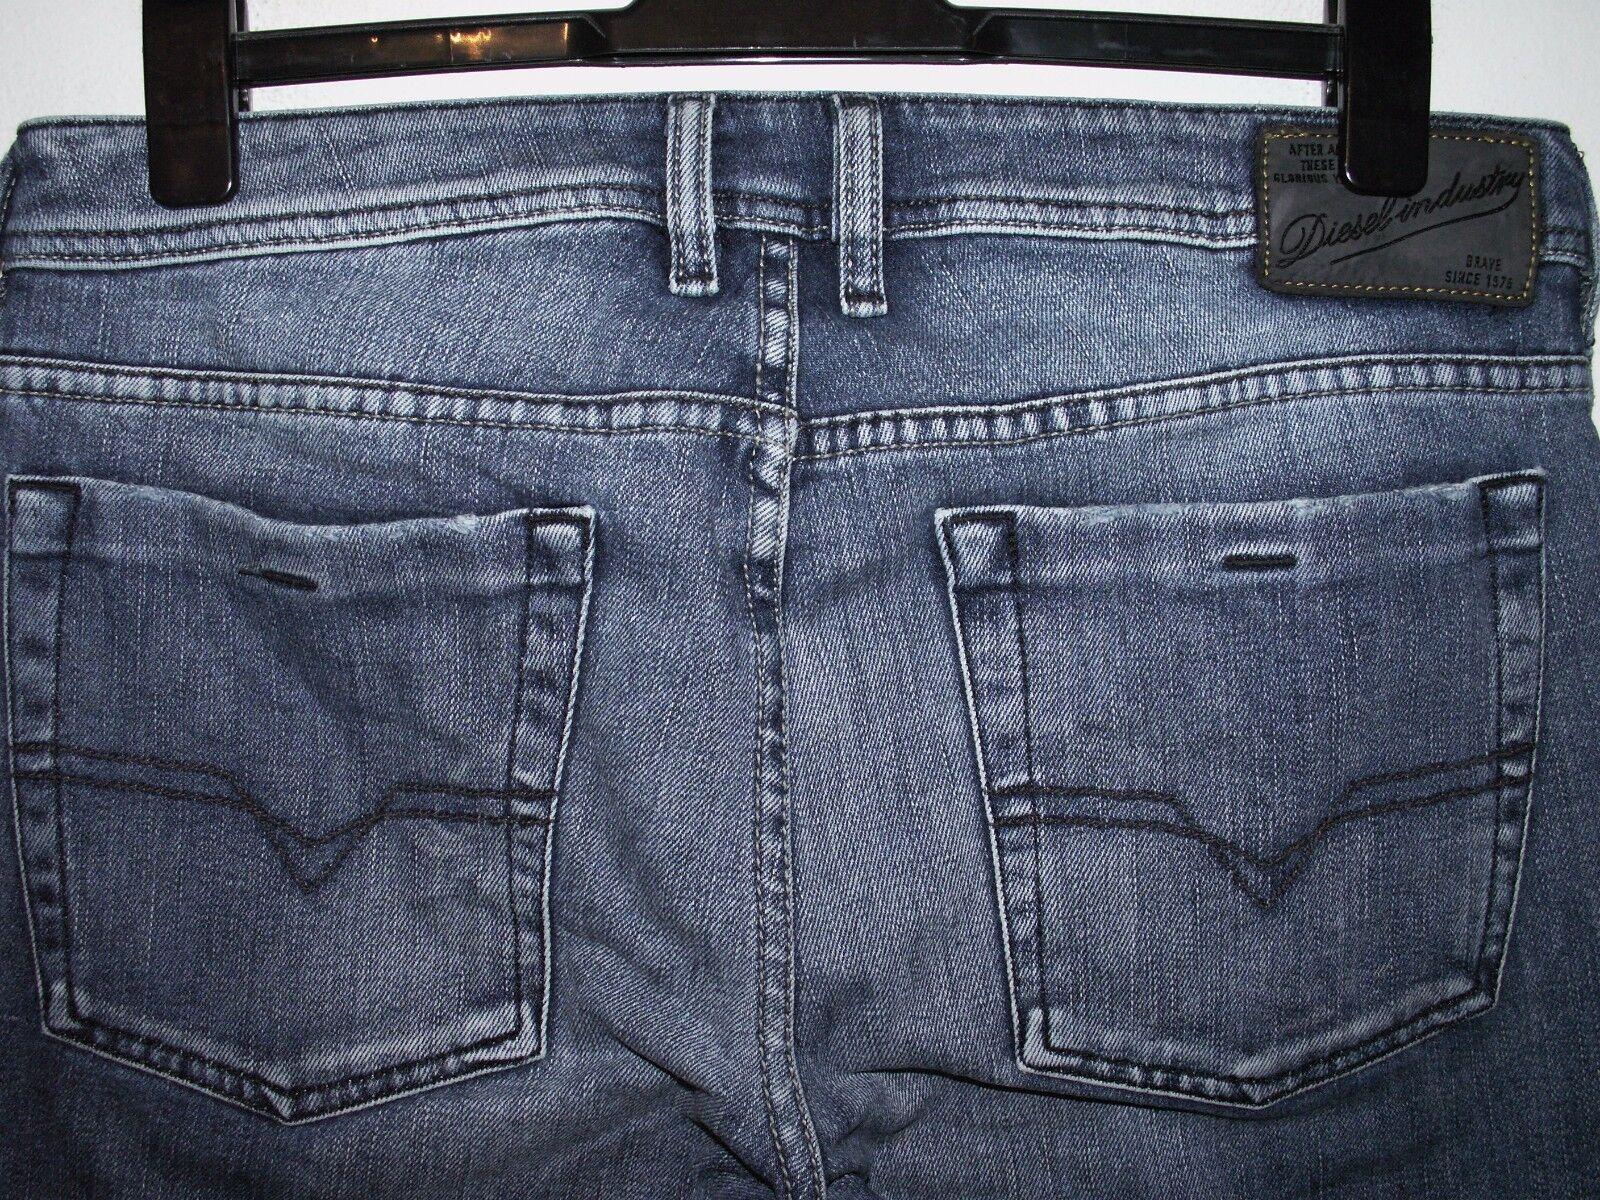 78822f4f Diesel zathan jeans wash W32 L32 (a3040) bootcut 0072J nfhxiy4275-Jeans